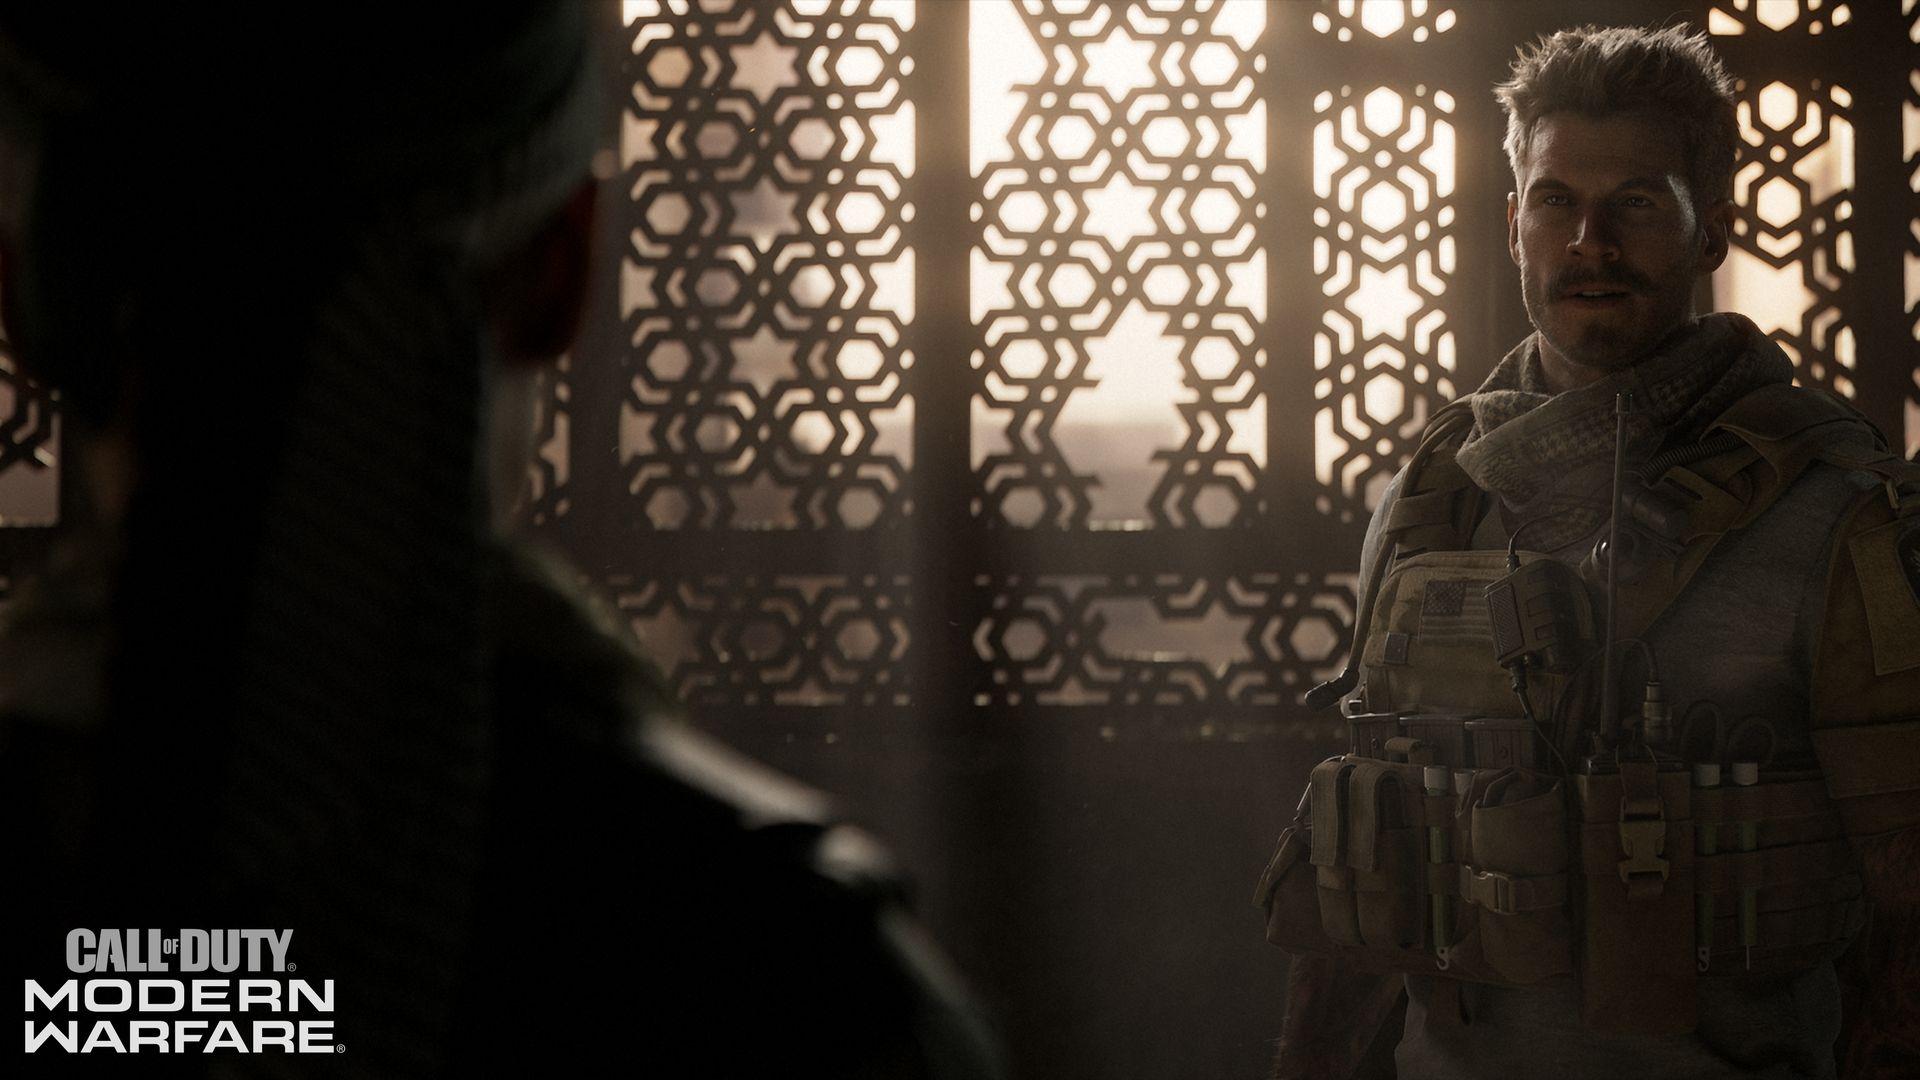 Call Of Duty Modern Warfare Story Trailer Reveals Good Ol